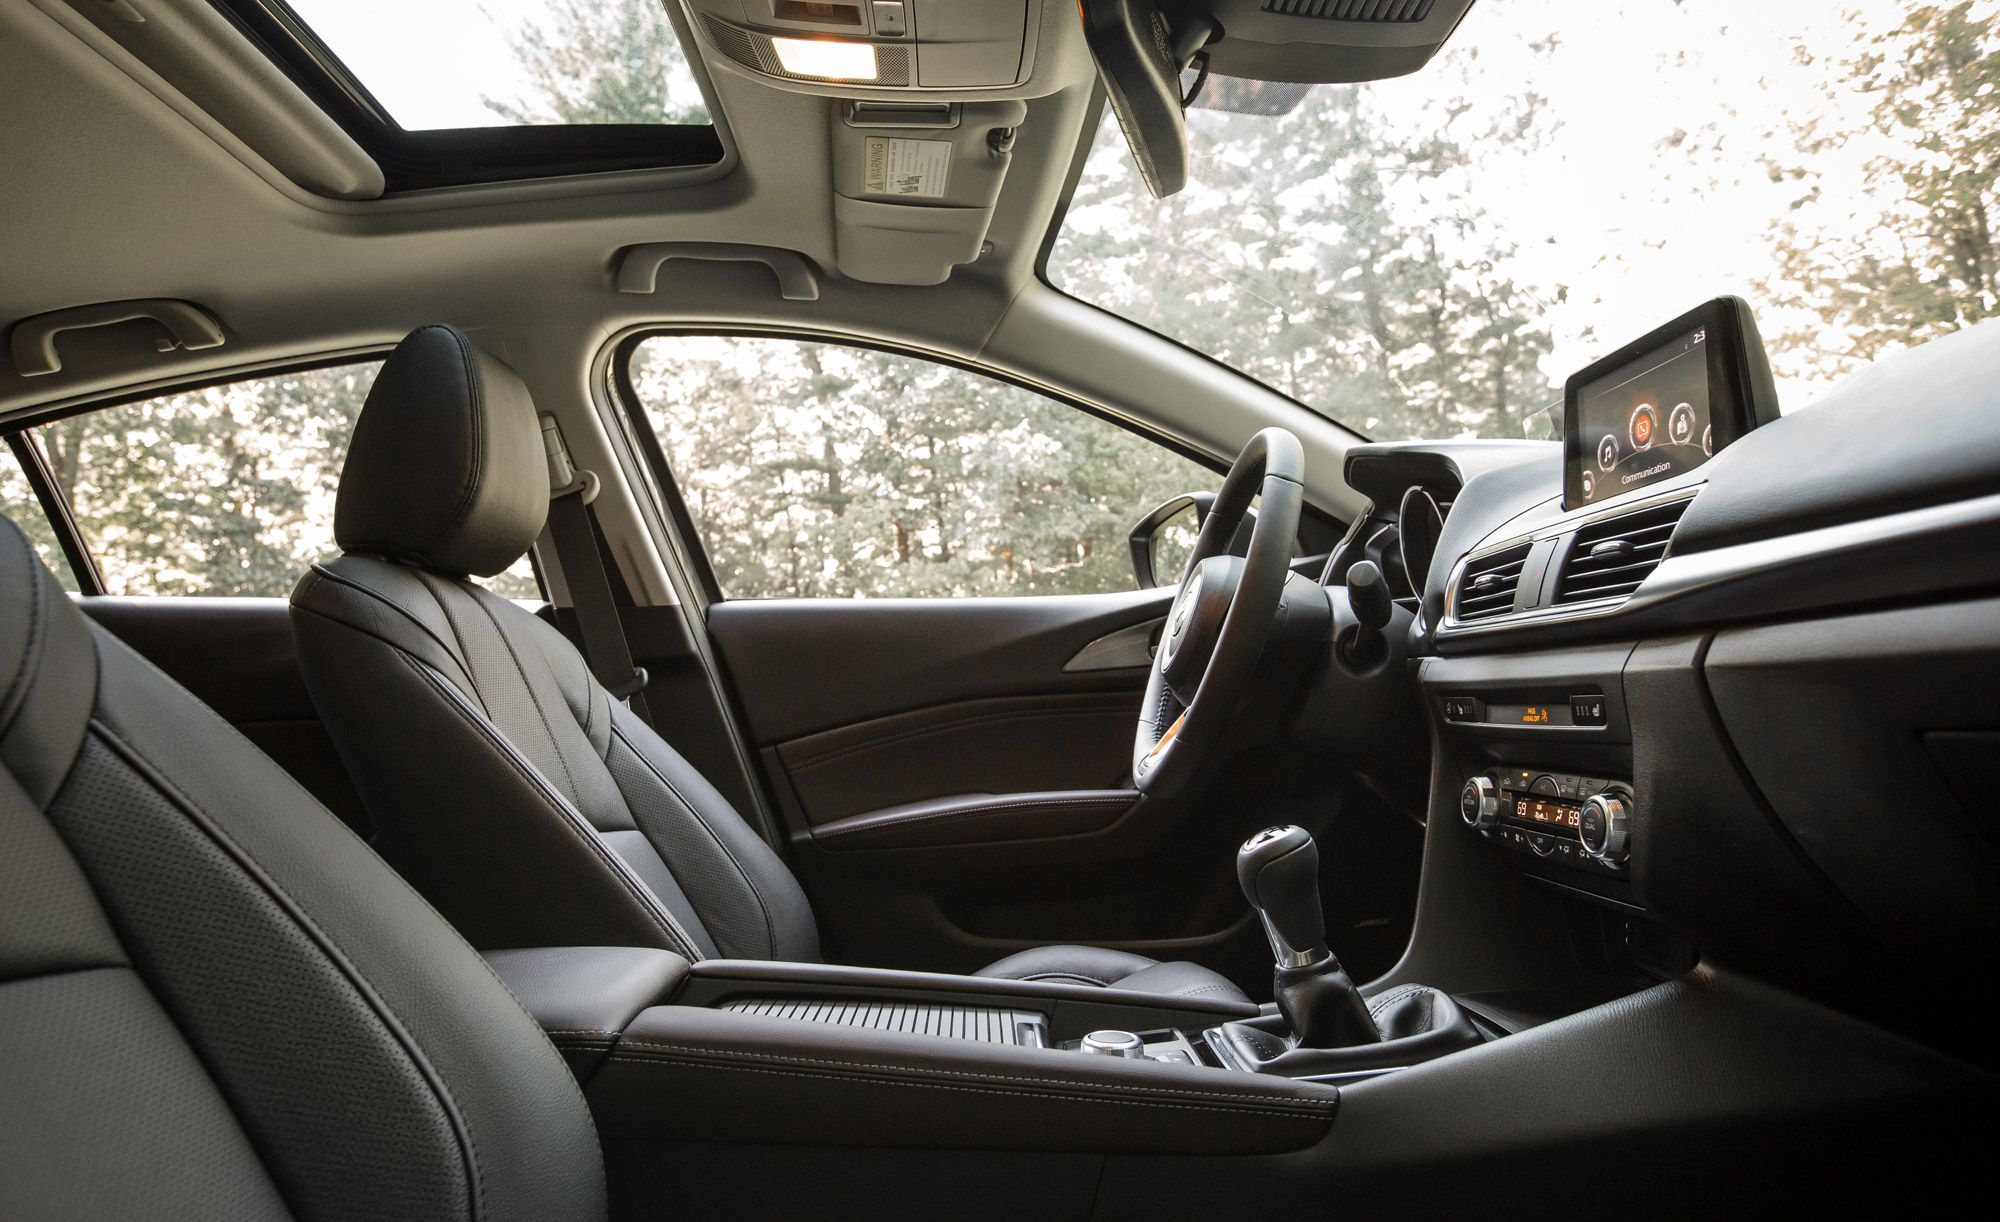 Mazda3 Interior Photos Best Car Interior Available for Under 30000